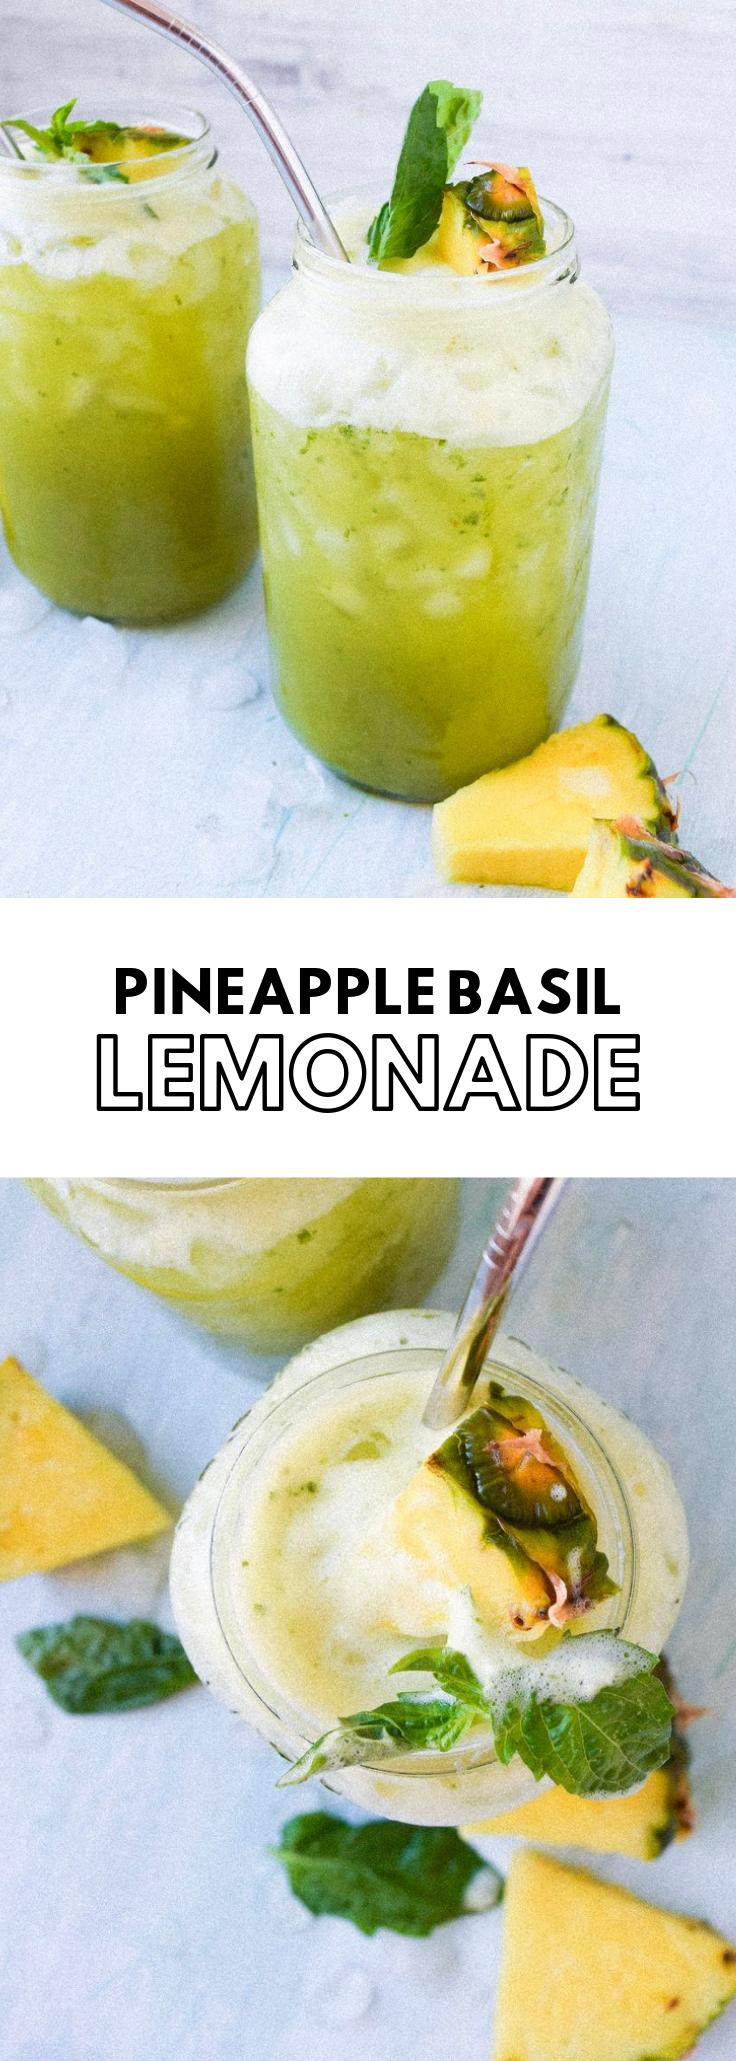 pineapple-basil-lemonade.jpg